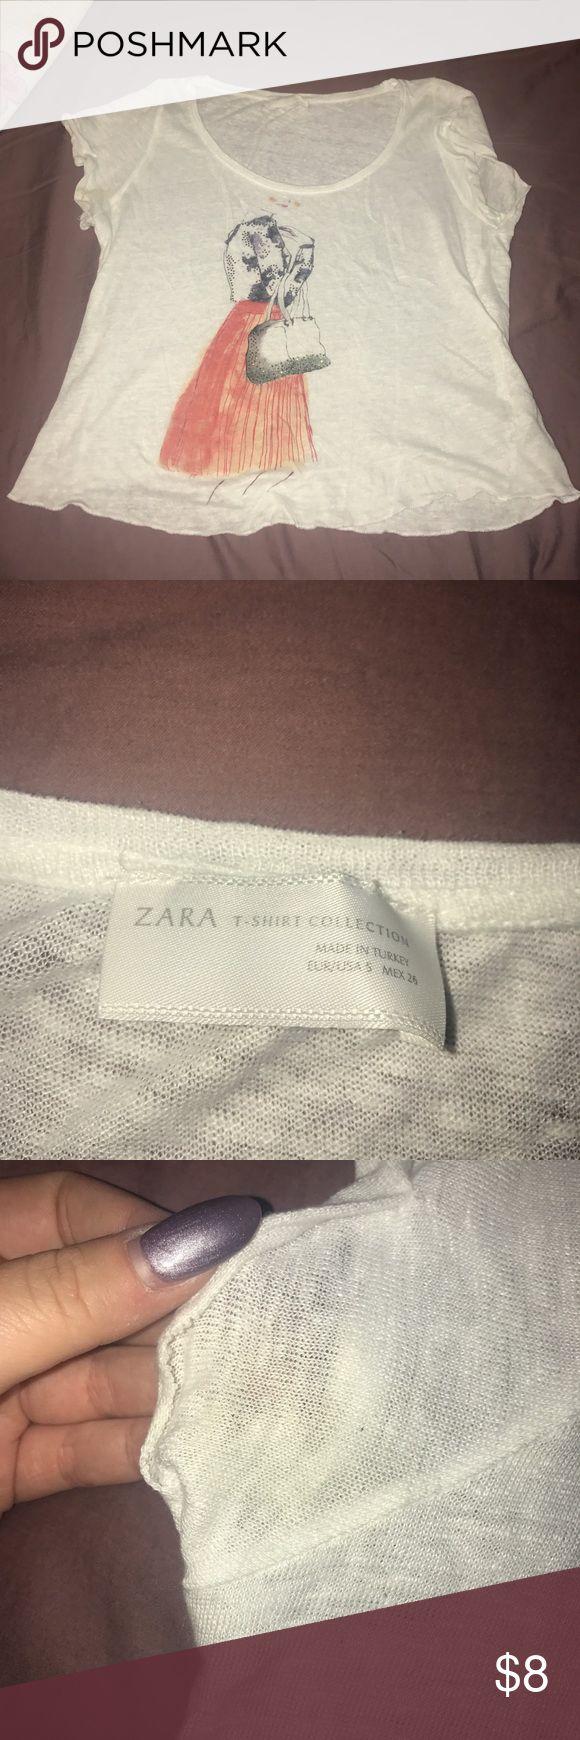 Zara tshirt used size small Zara tshirt used size small Zara Tops